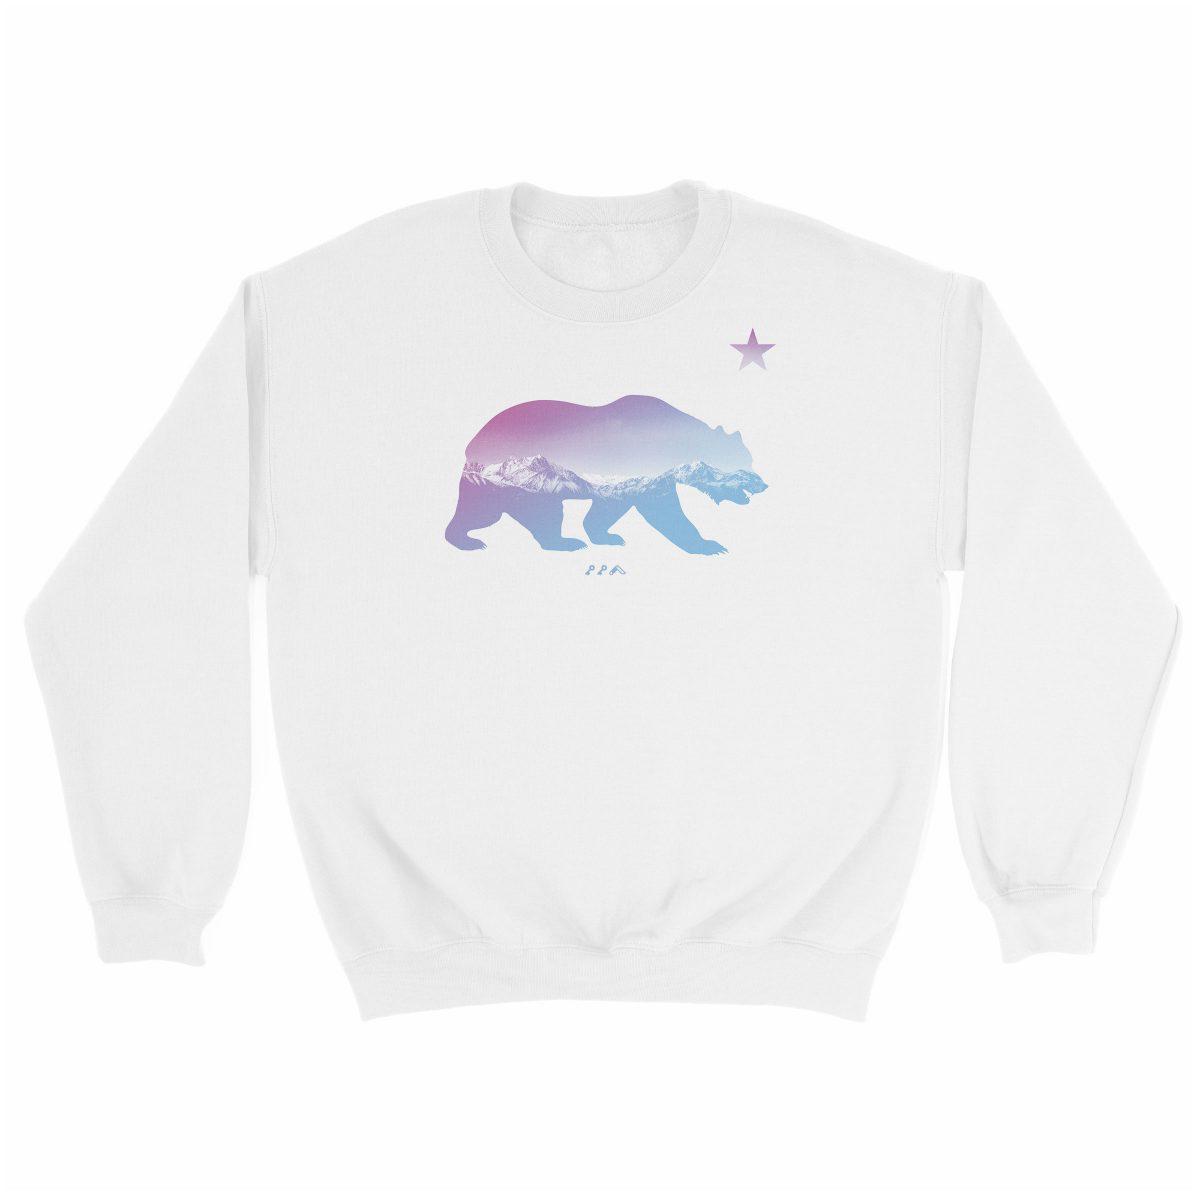 """BARE MOUNTAINS"" california bear sweatshirts in white by kikicutt"